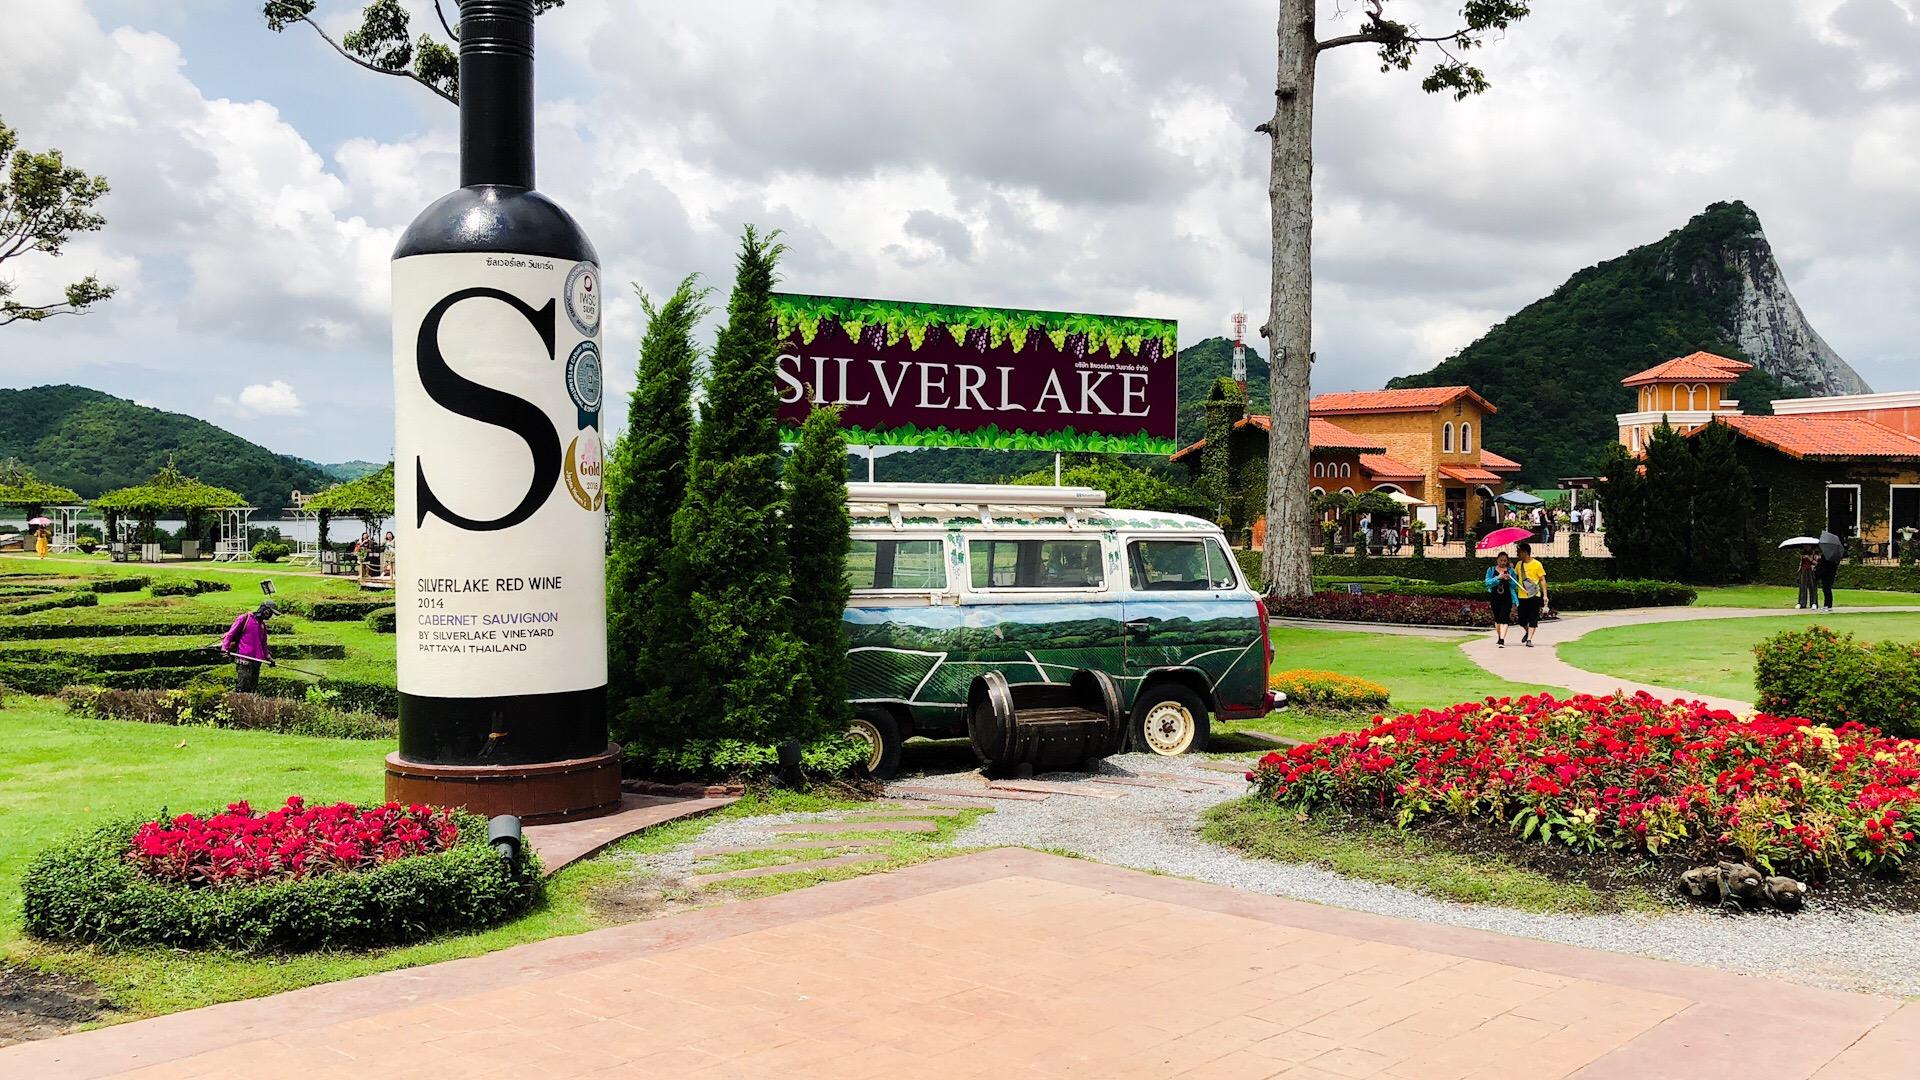 Silver lake vineyard